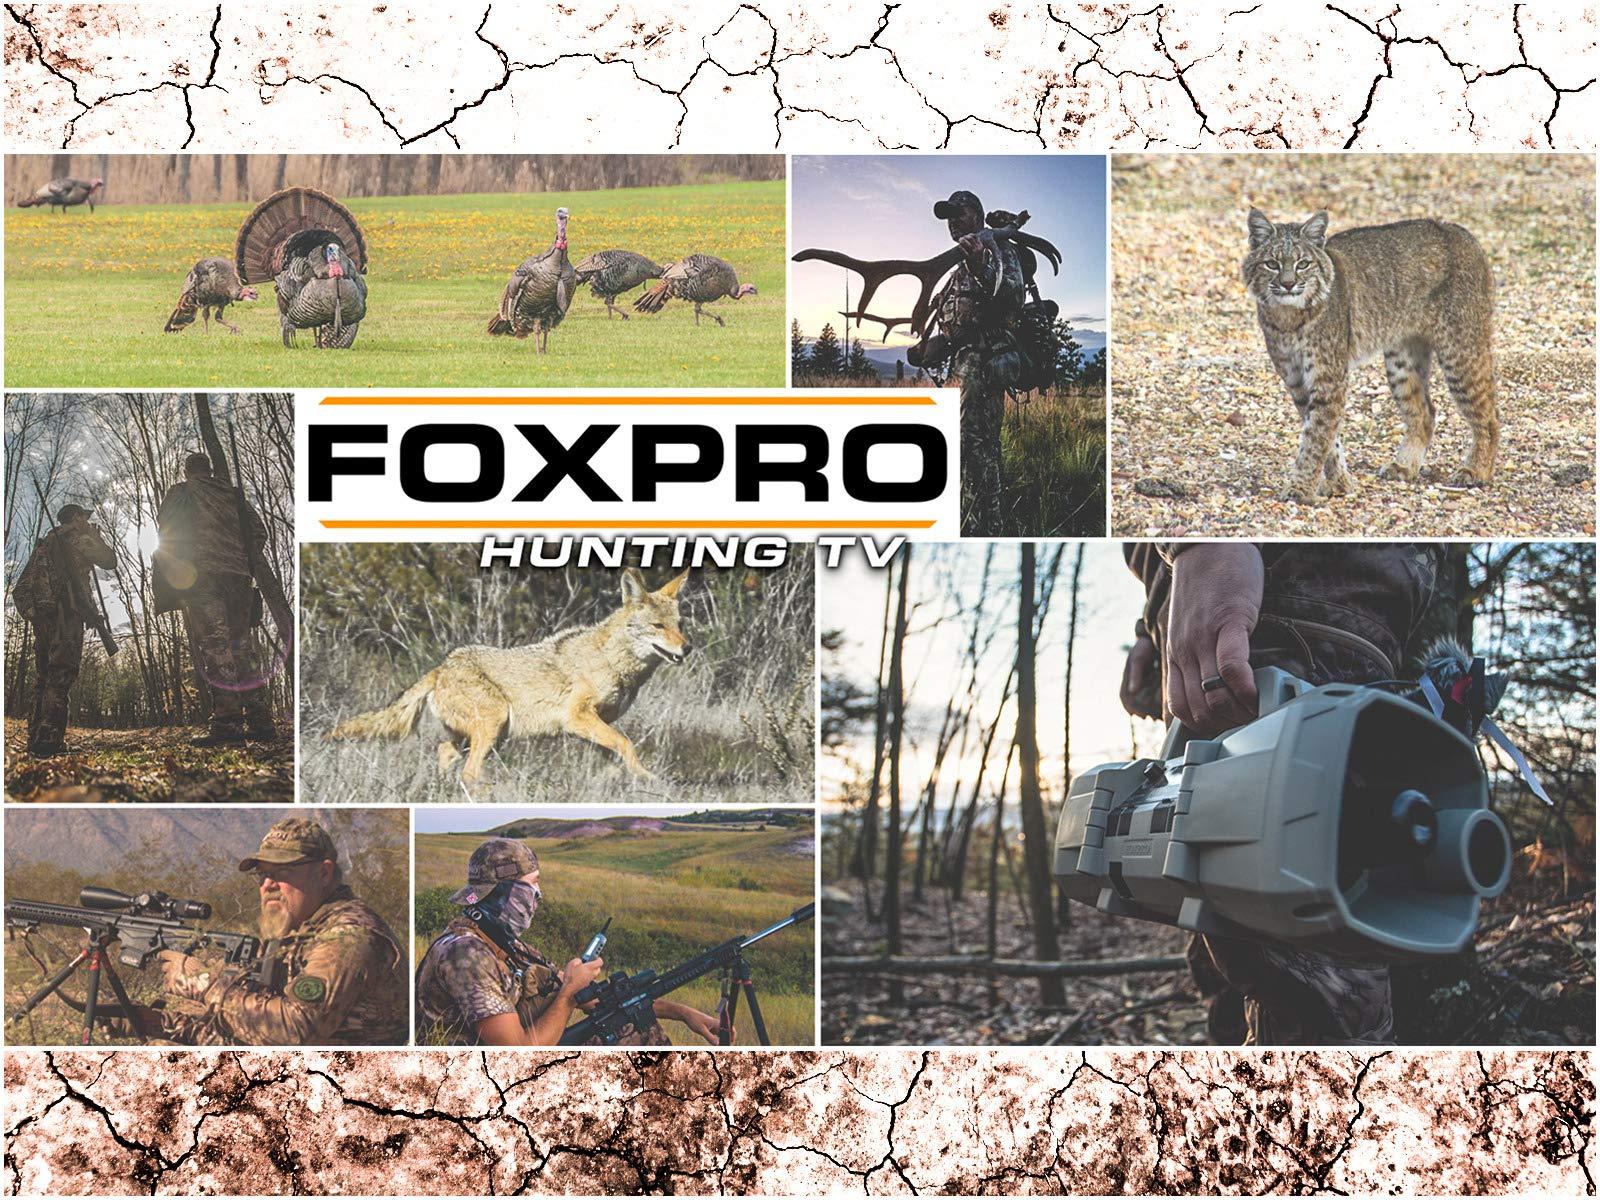 Foxpro Hunting